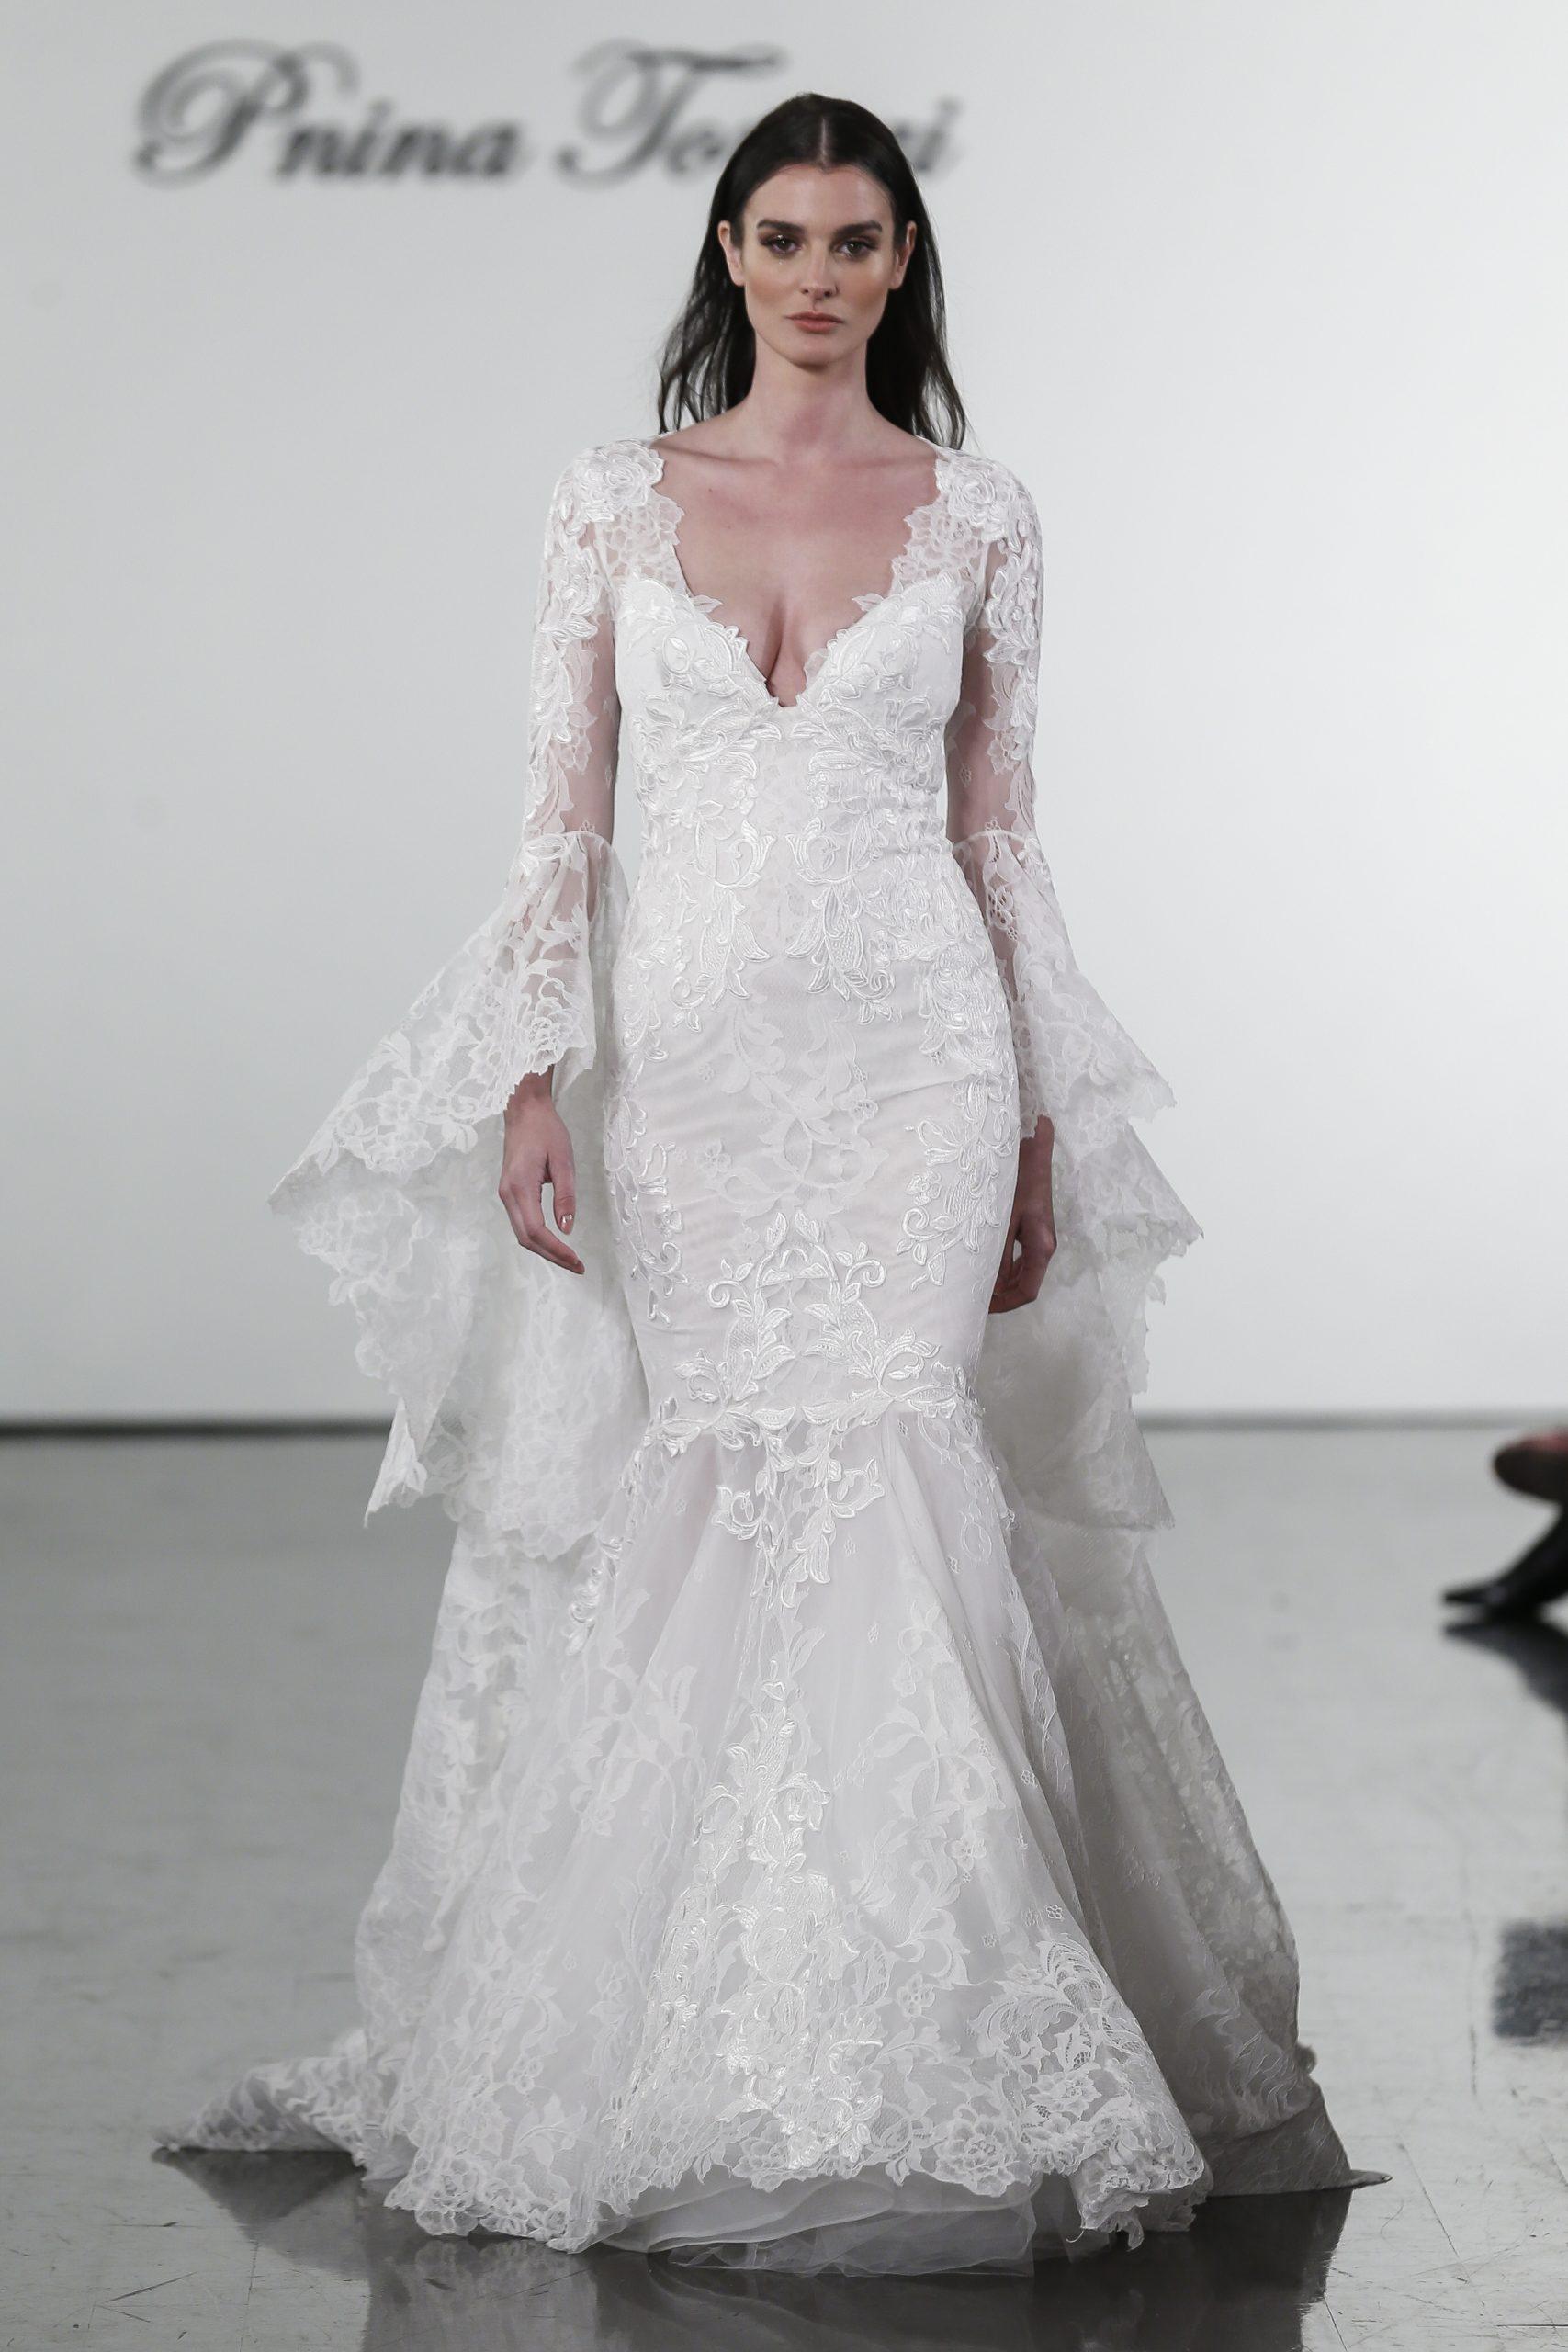 Long Sleeve V Neck Mermaid Wedding Dress With Bell Sleeves Kleinfeld Bridal,Wedding Dress Chicago Affordable